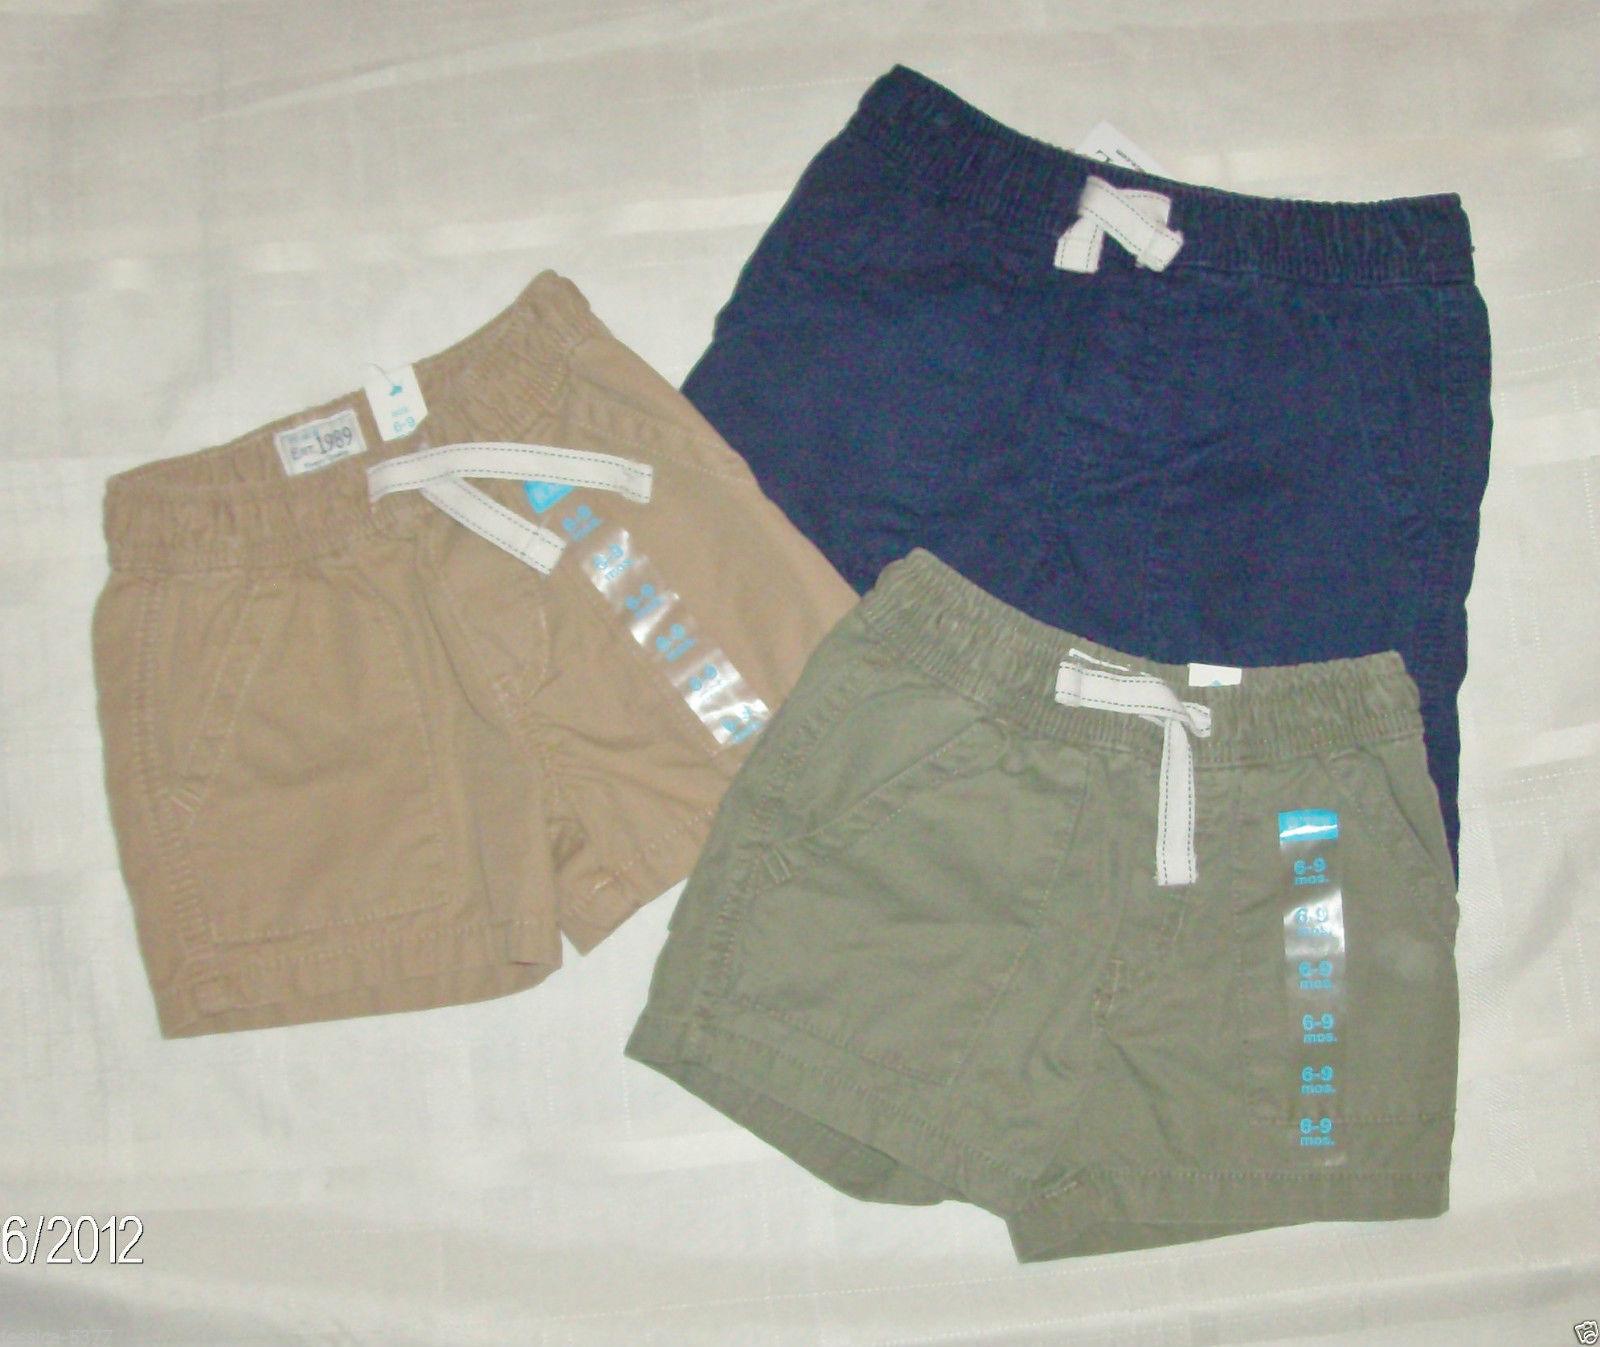 Khaki *NWT* Circo Infant Toddler Shorts 12m 18m 3T Black,Gray,Camo,Blue stripe